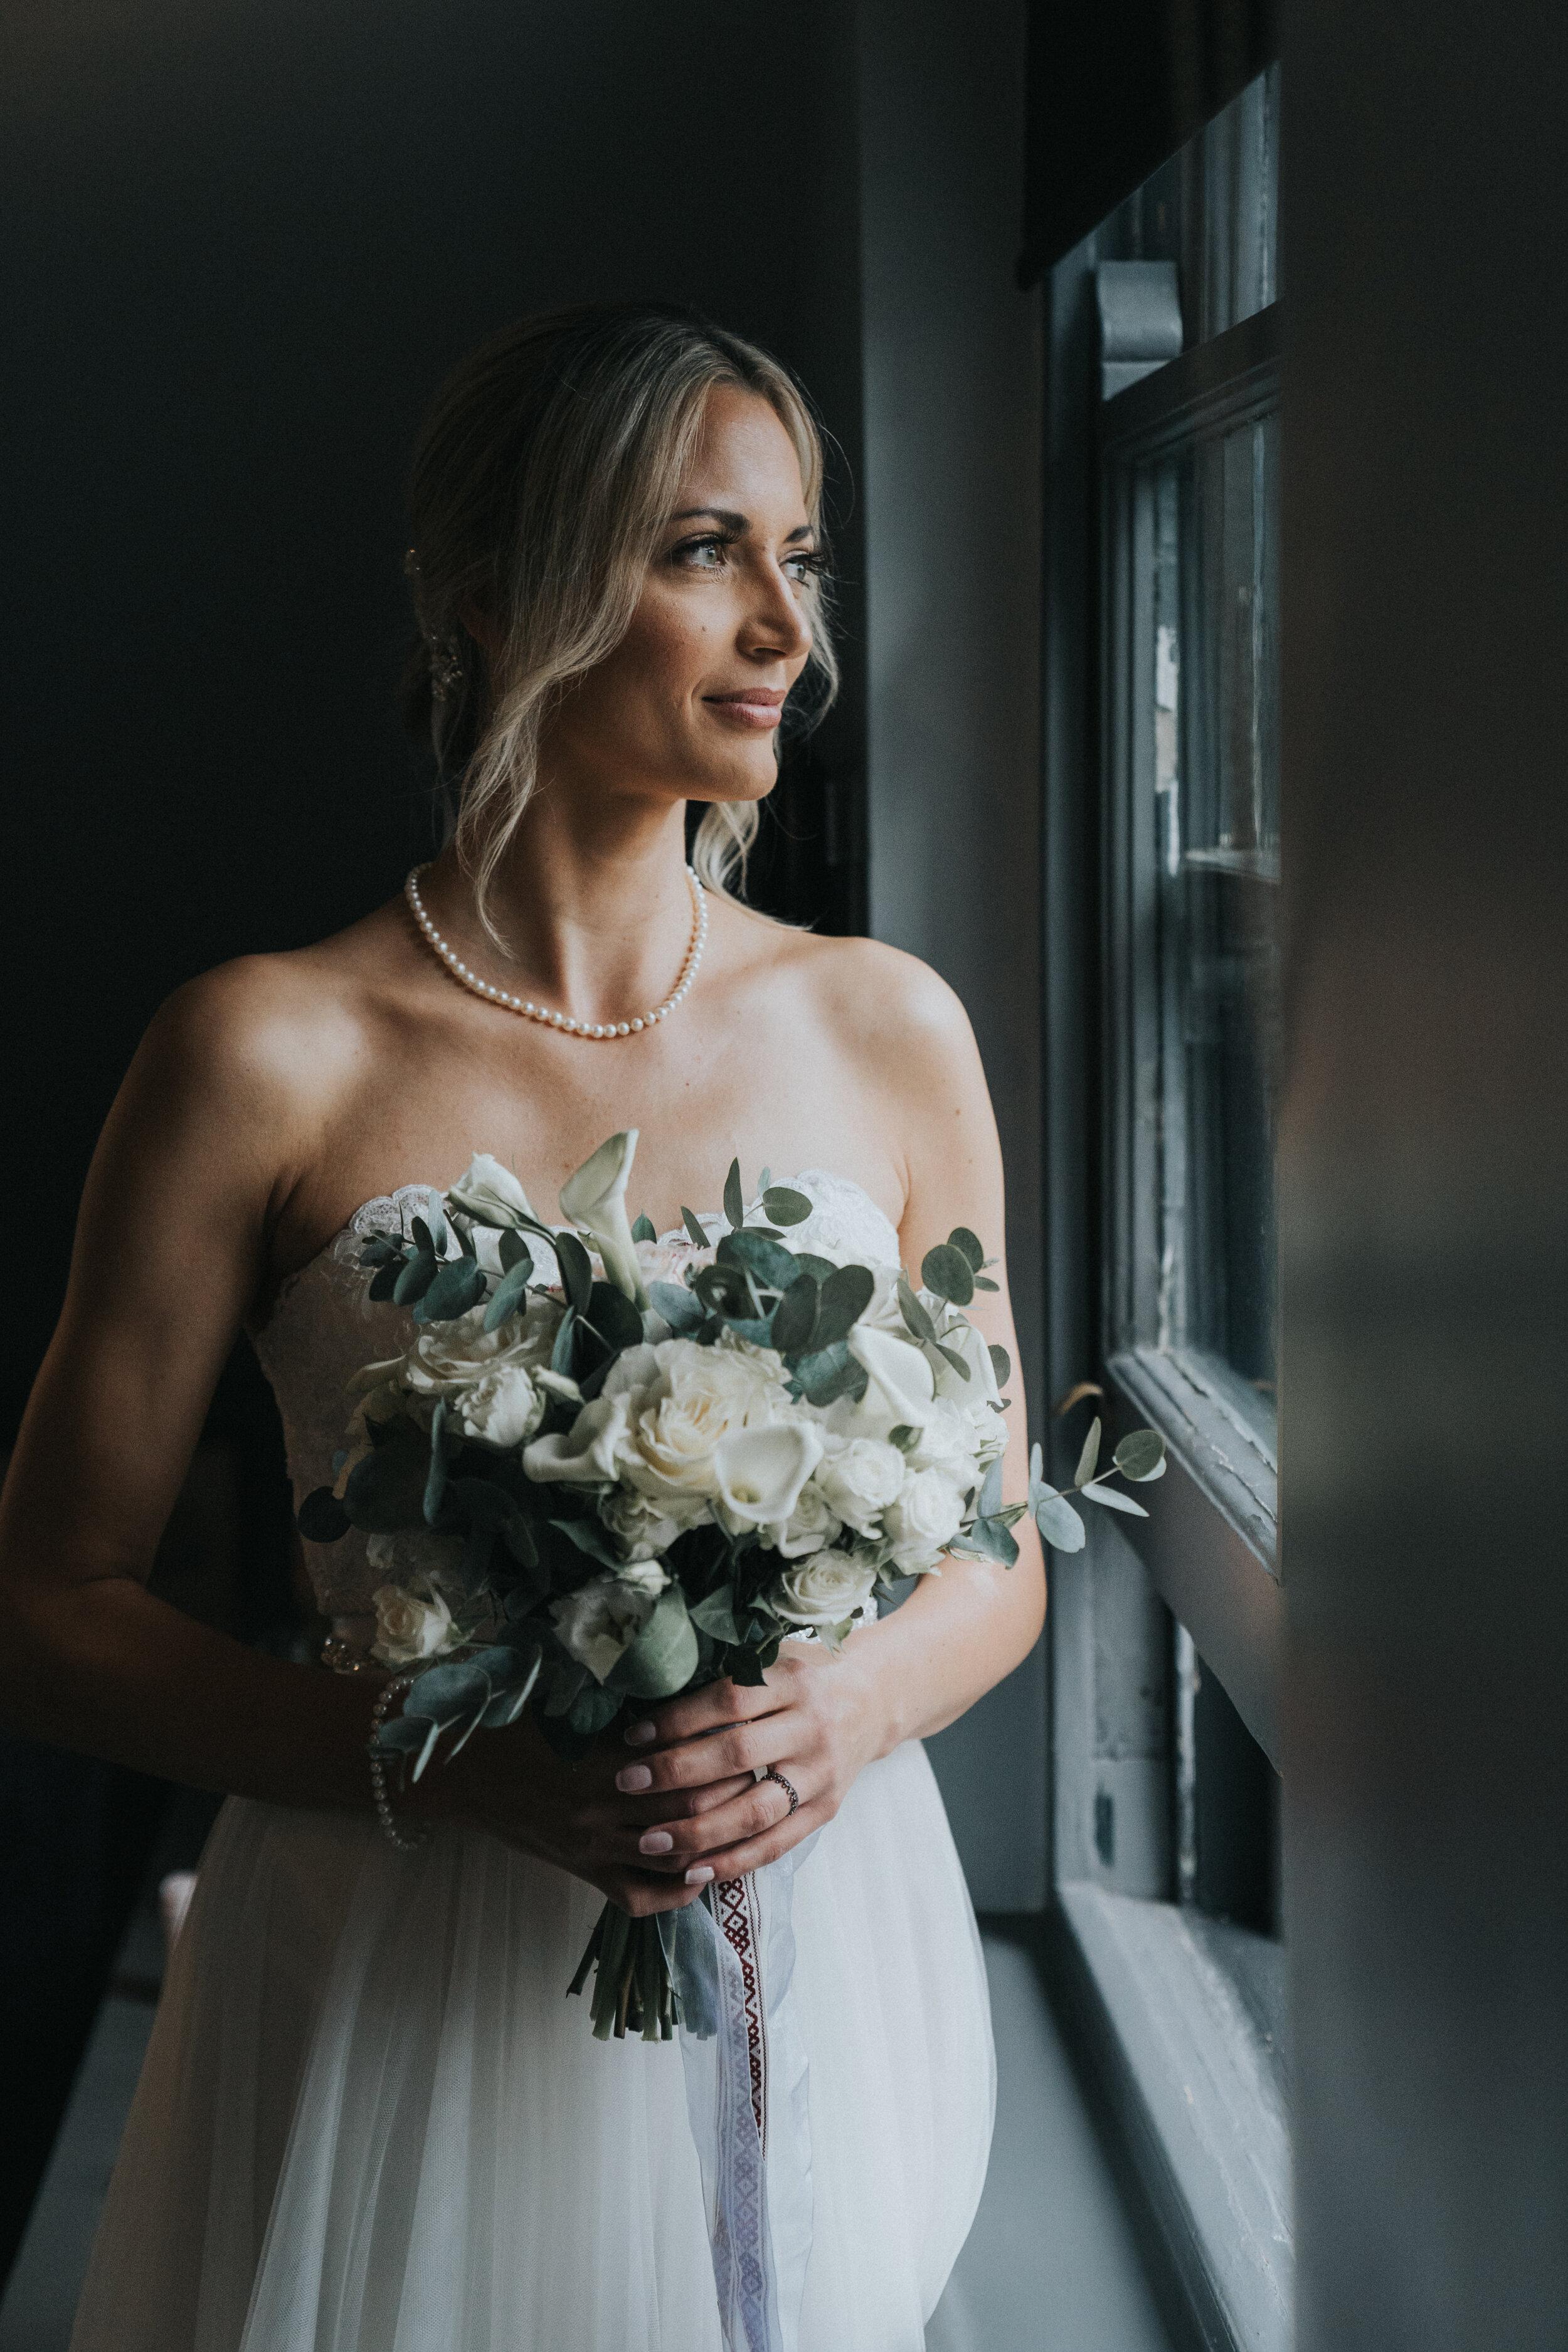 bride-prep-chelsea-london-wedding-photographer-06